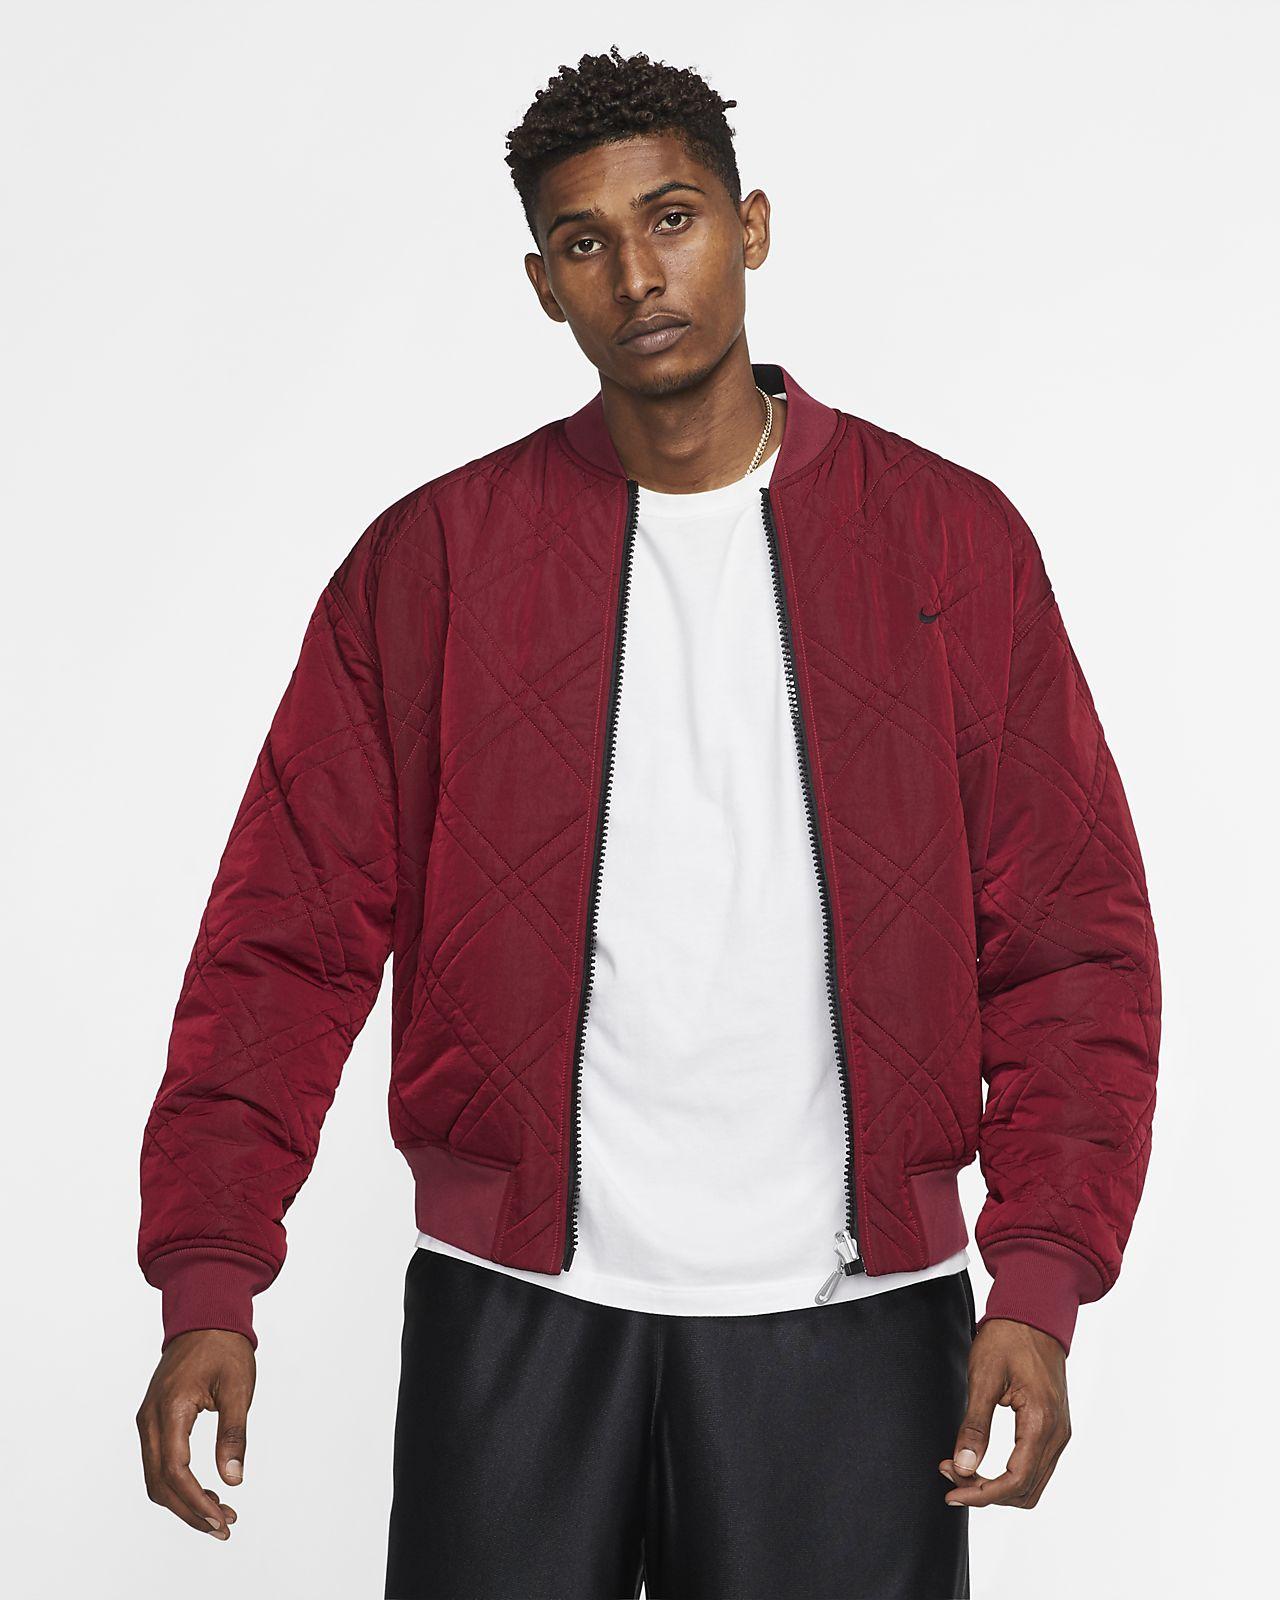 Nike Classic x Sport Men's Reversible Jacket